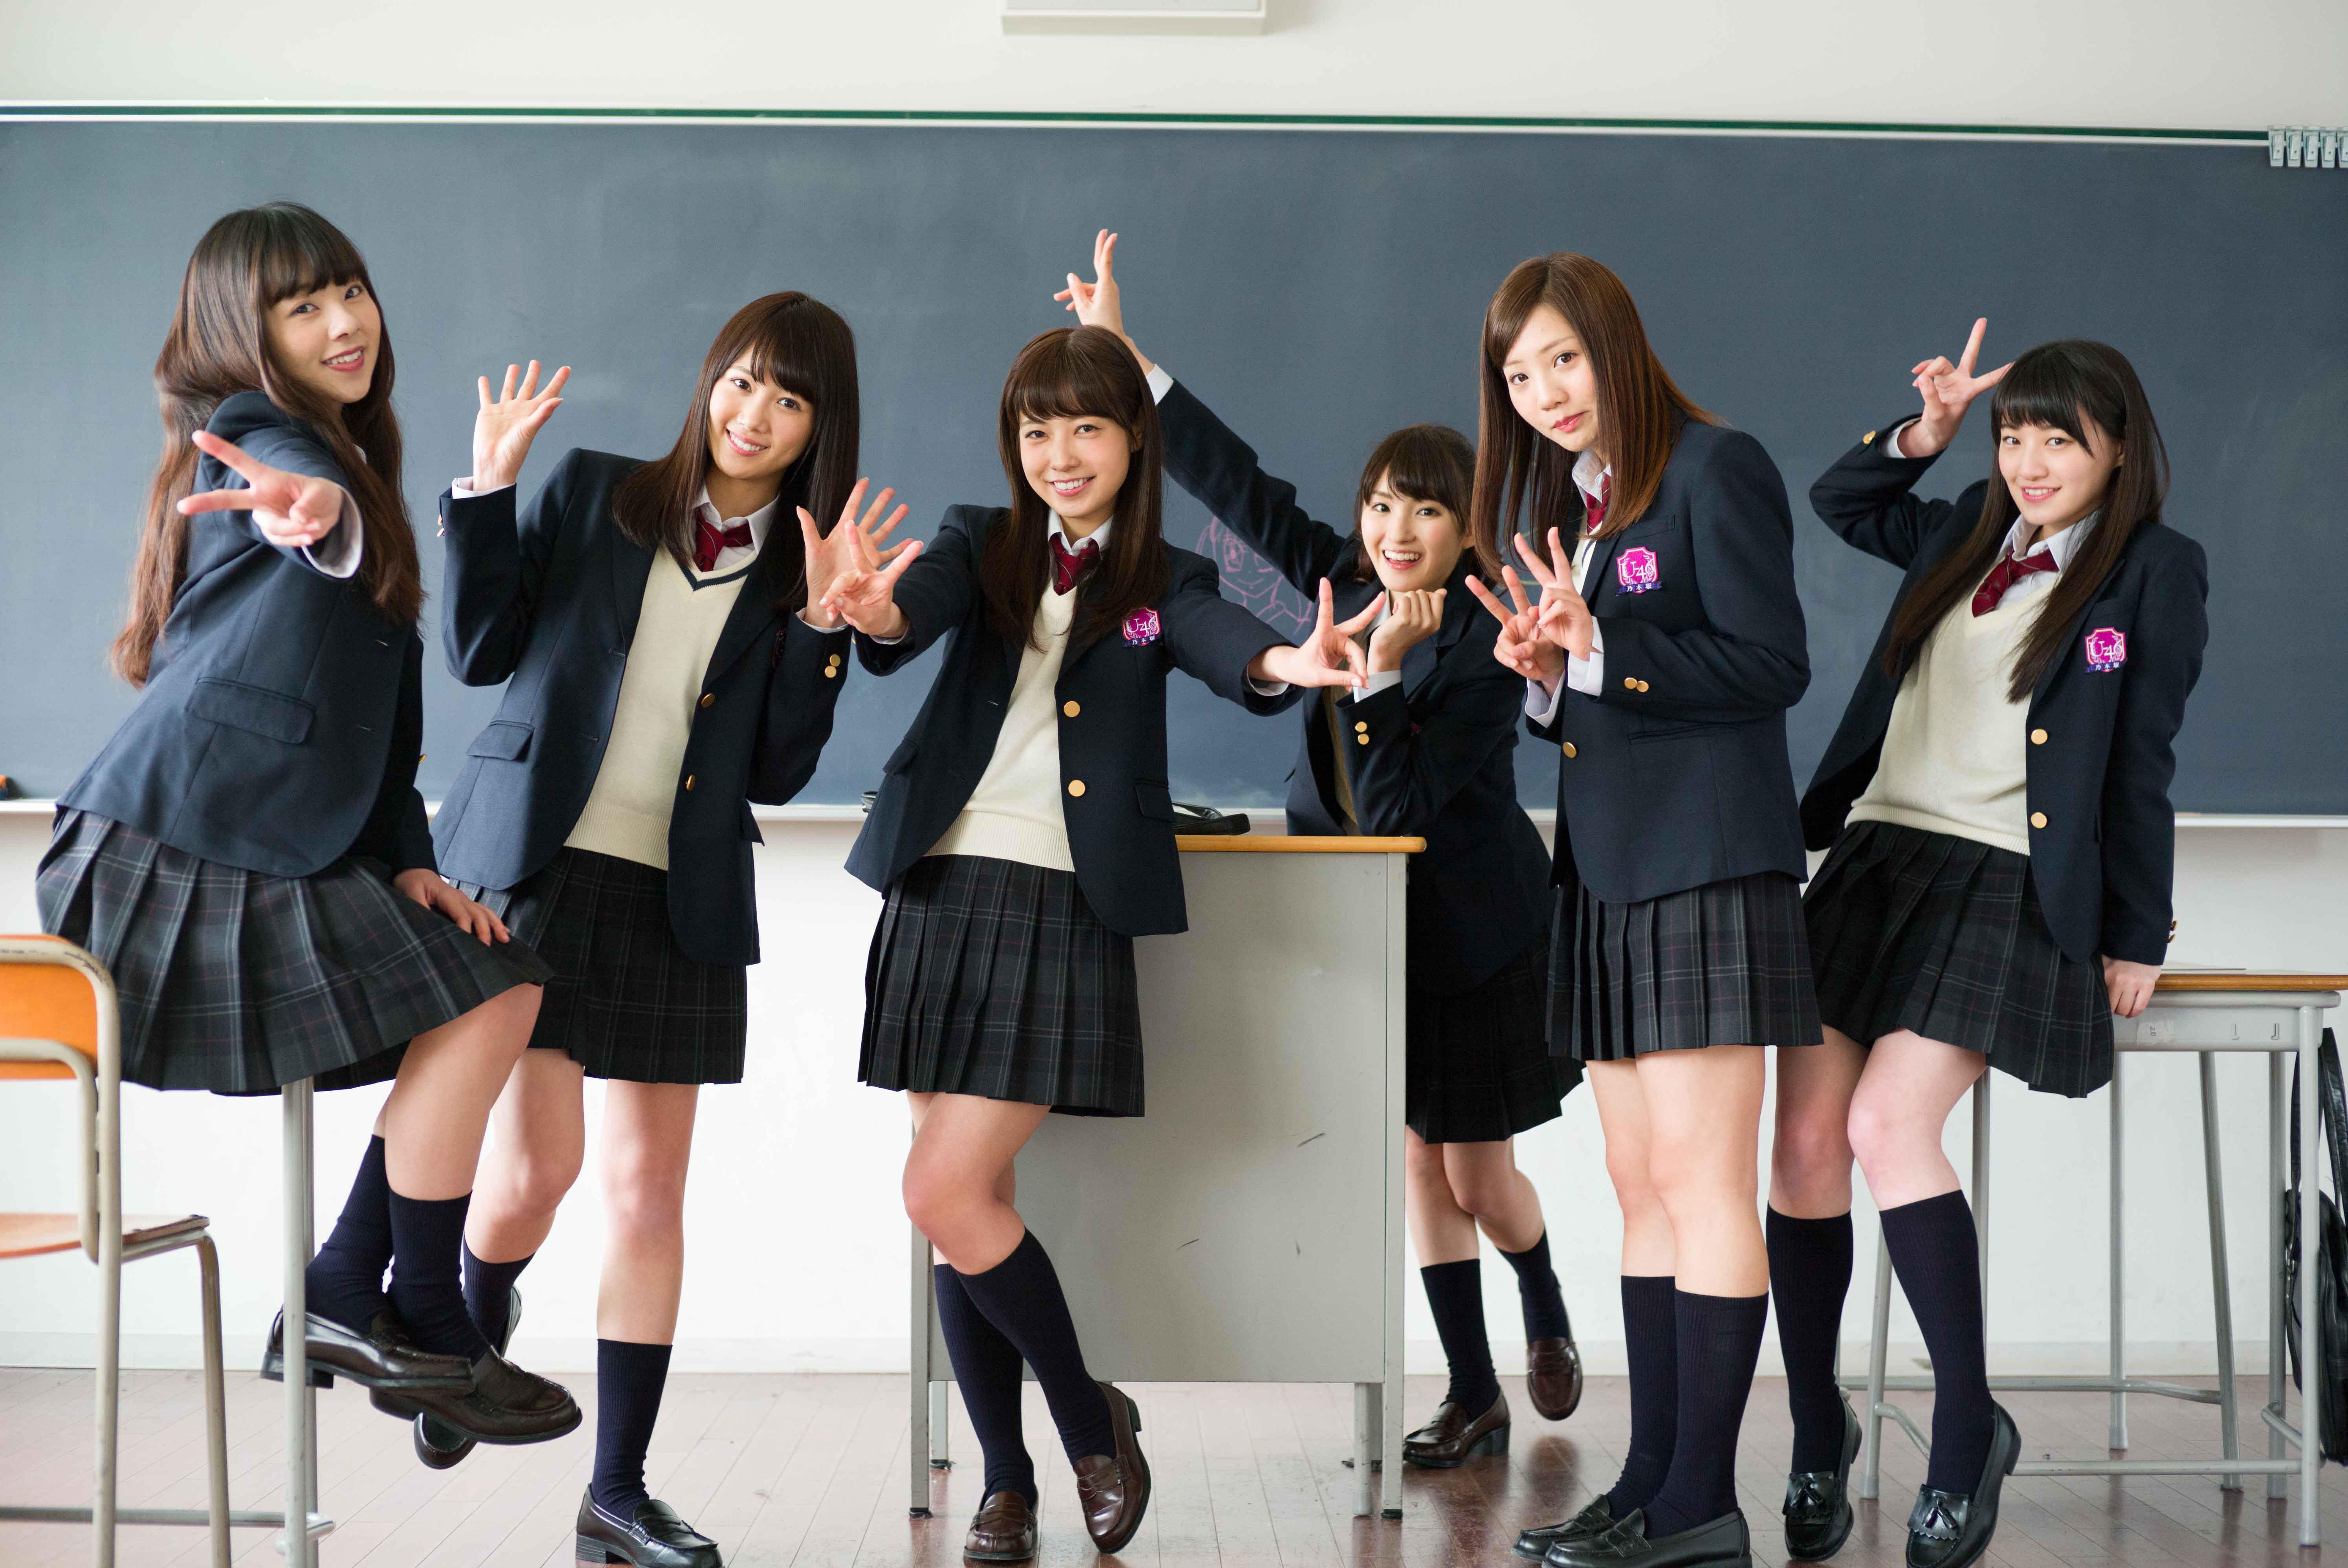 A scuola schoolgirl - 1 10